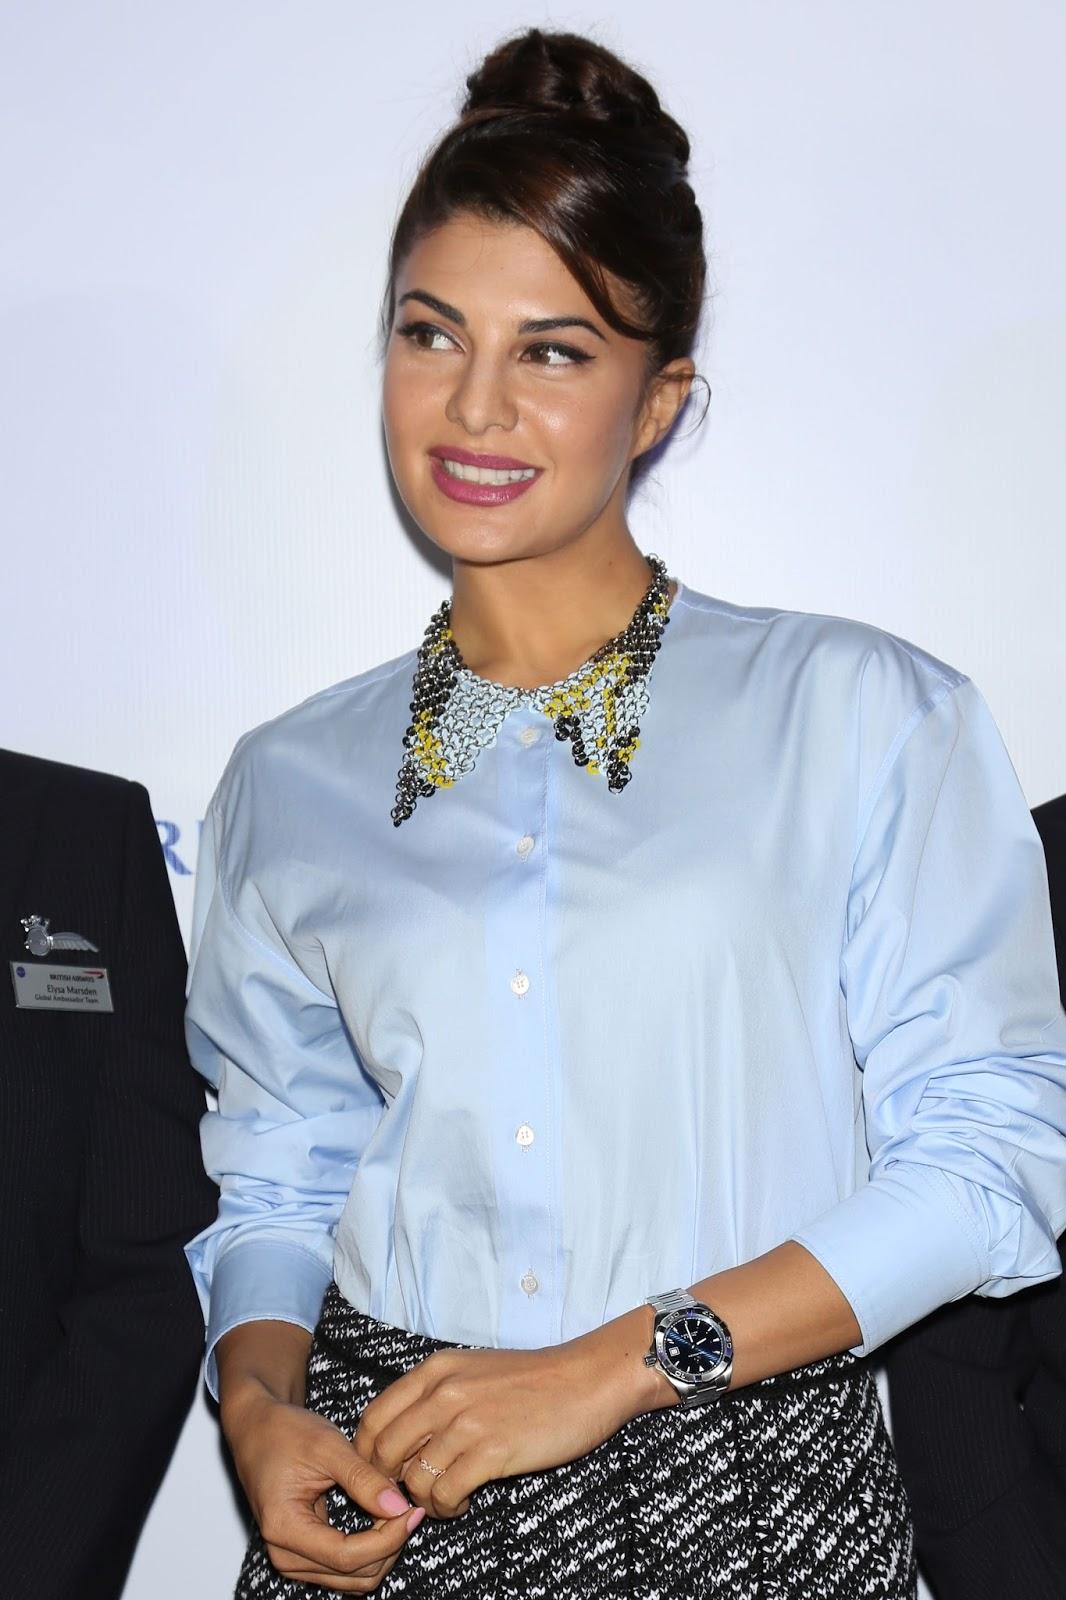 Jacqueline Fernandez Photos In Blue Shirt